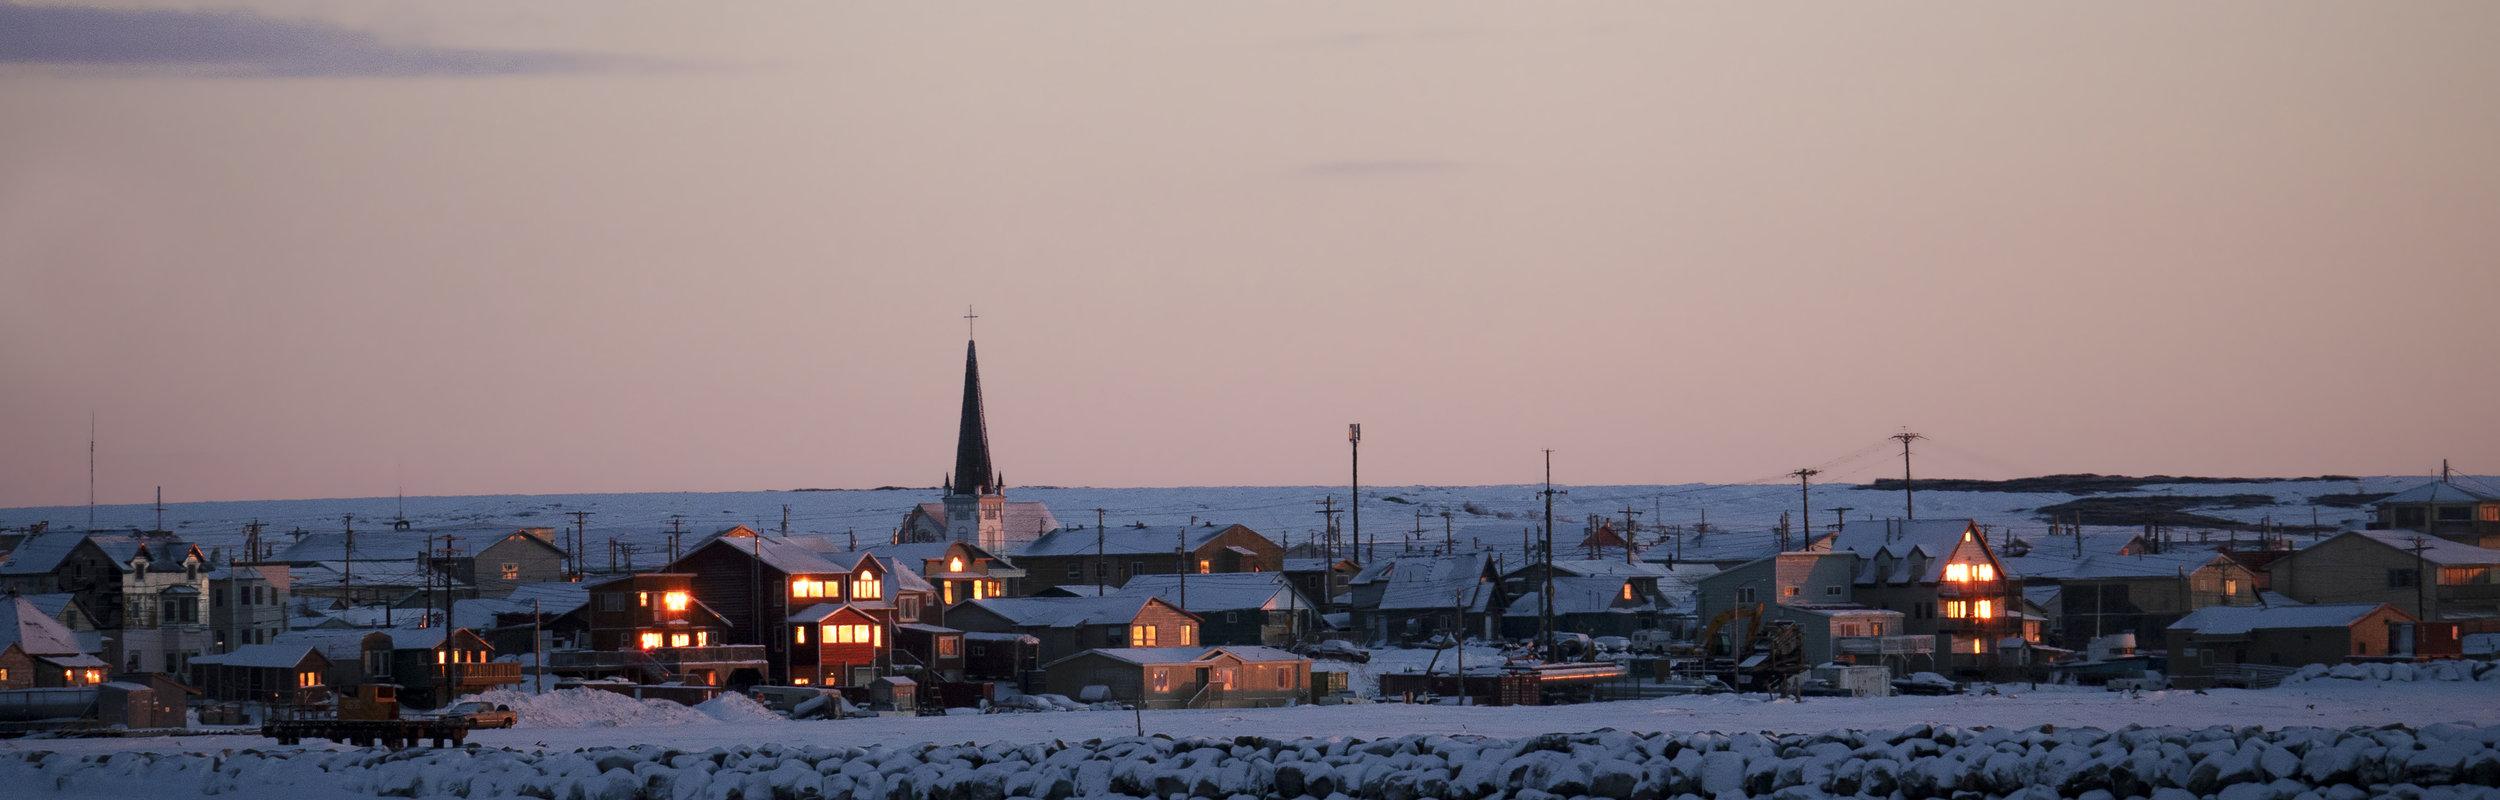 Winter solstice in Nome, Alaska